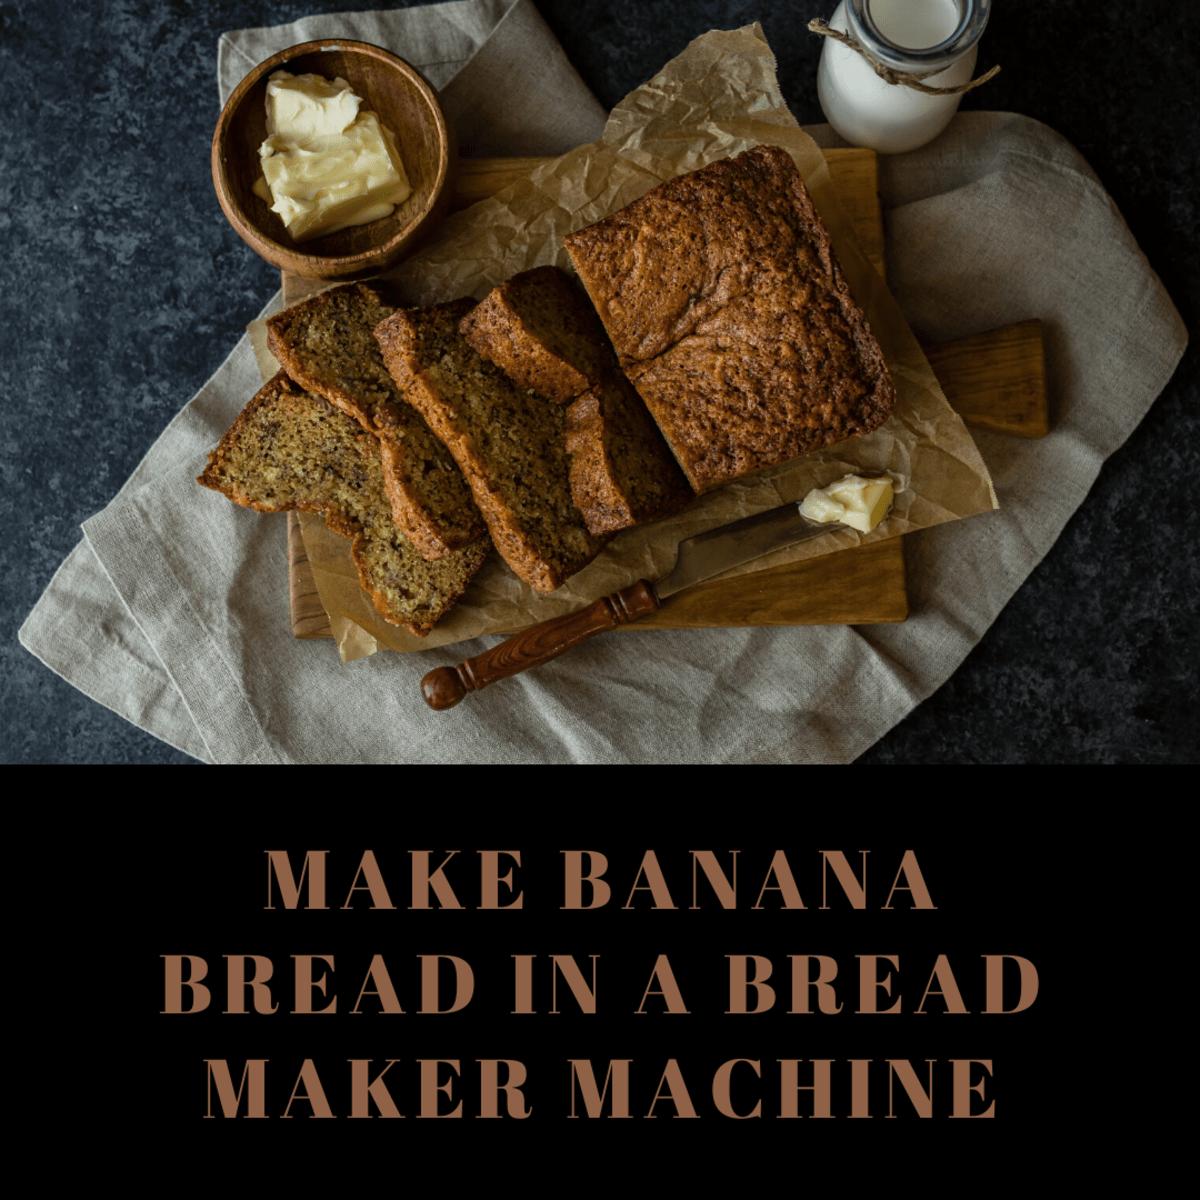 Banana Bread Recipe For Bread Maker